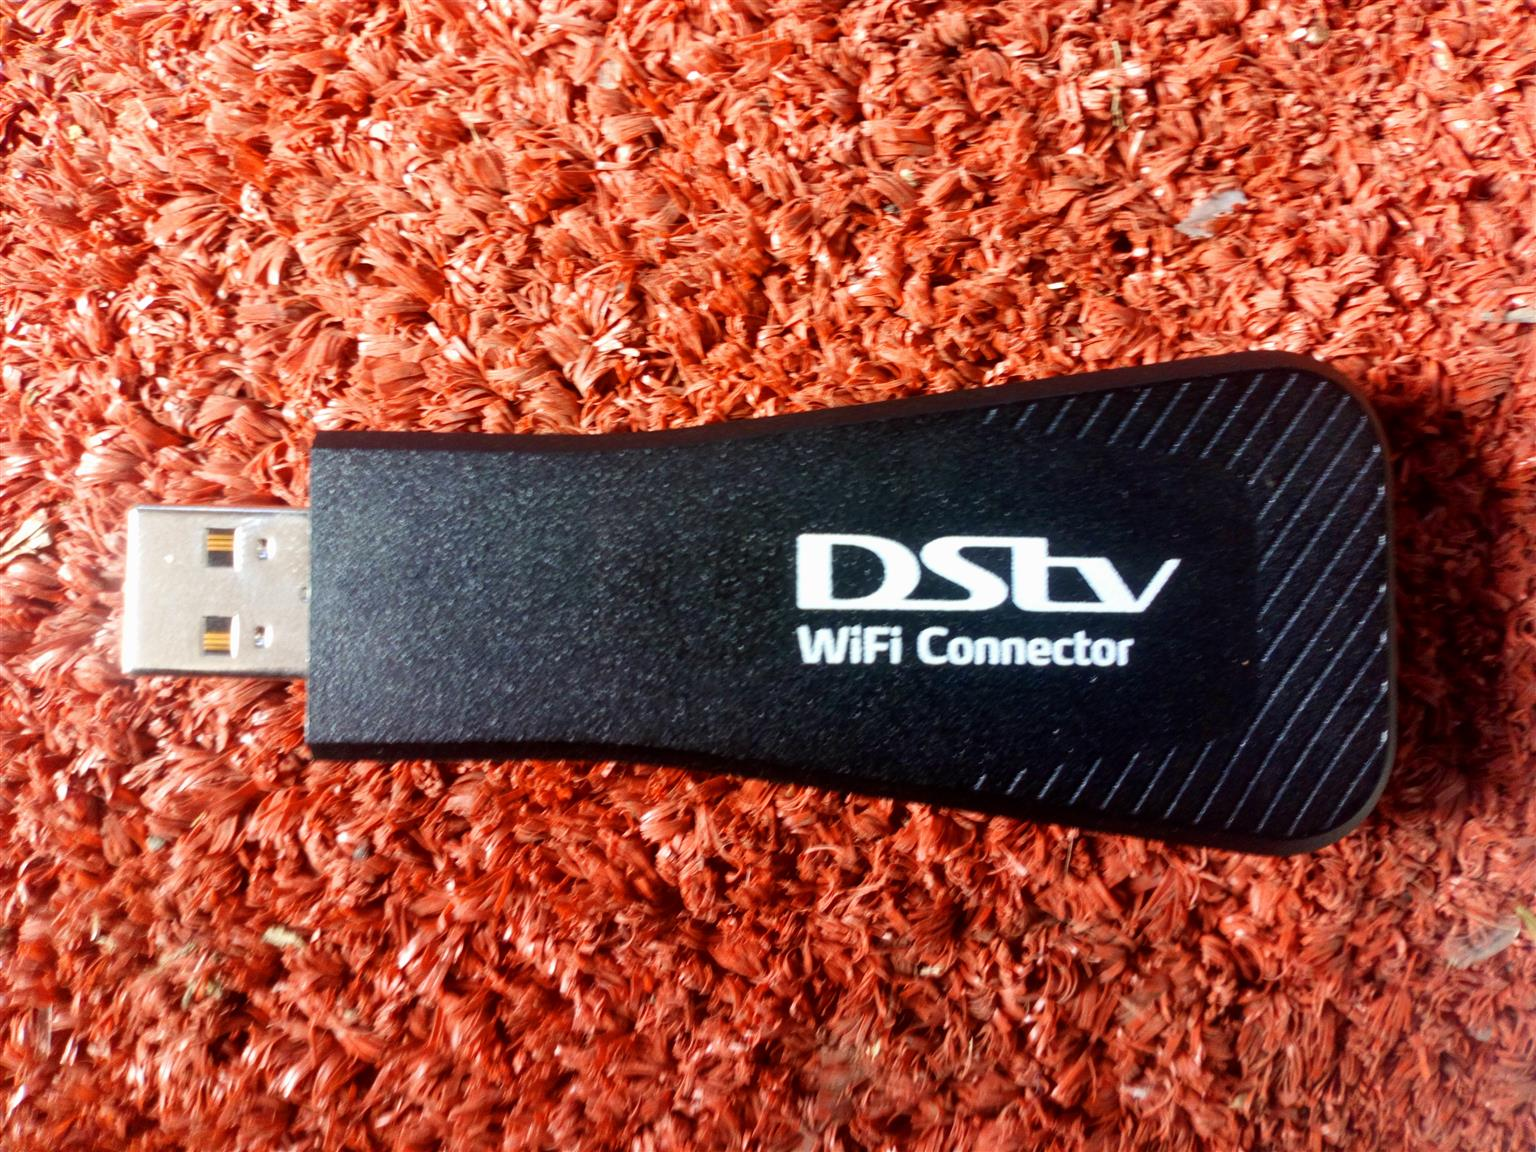 DSTV wifi connector